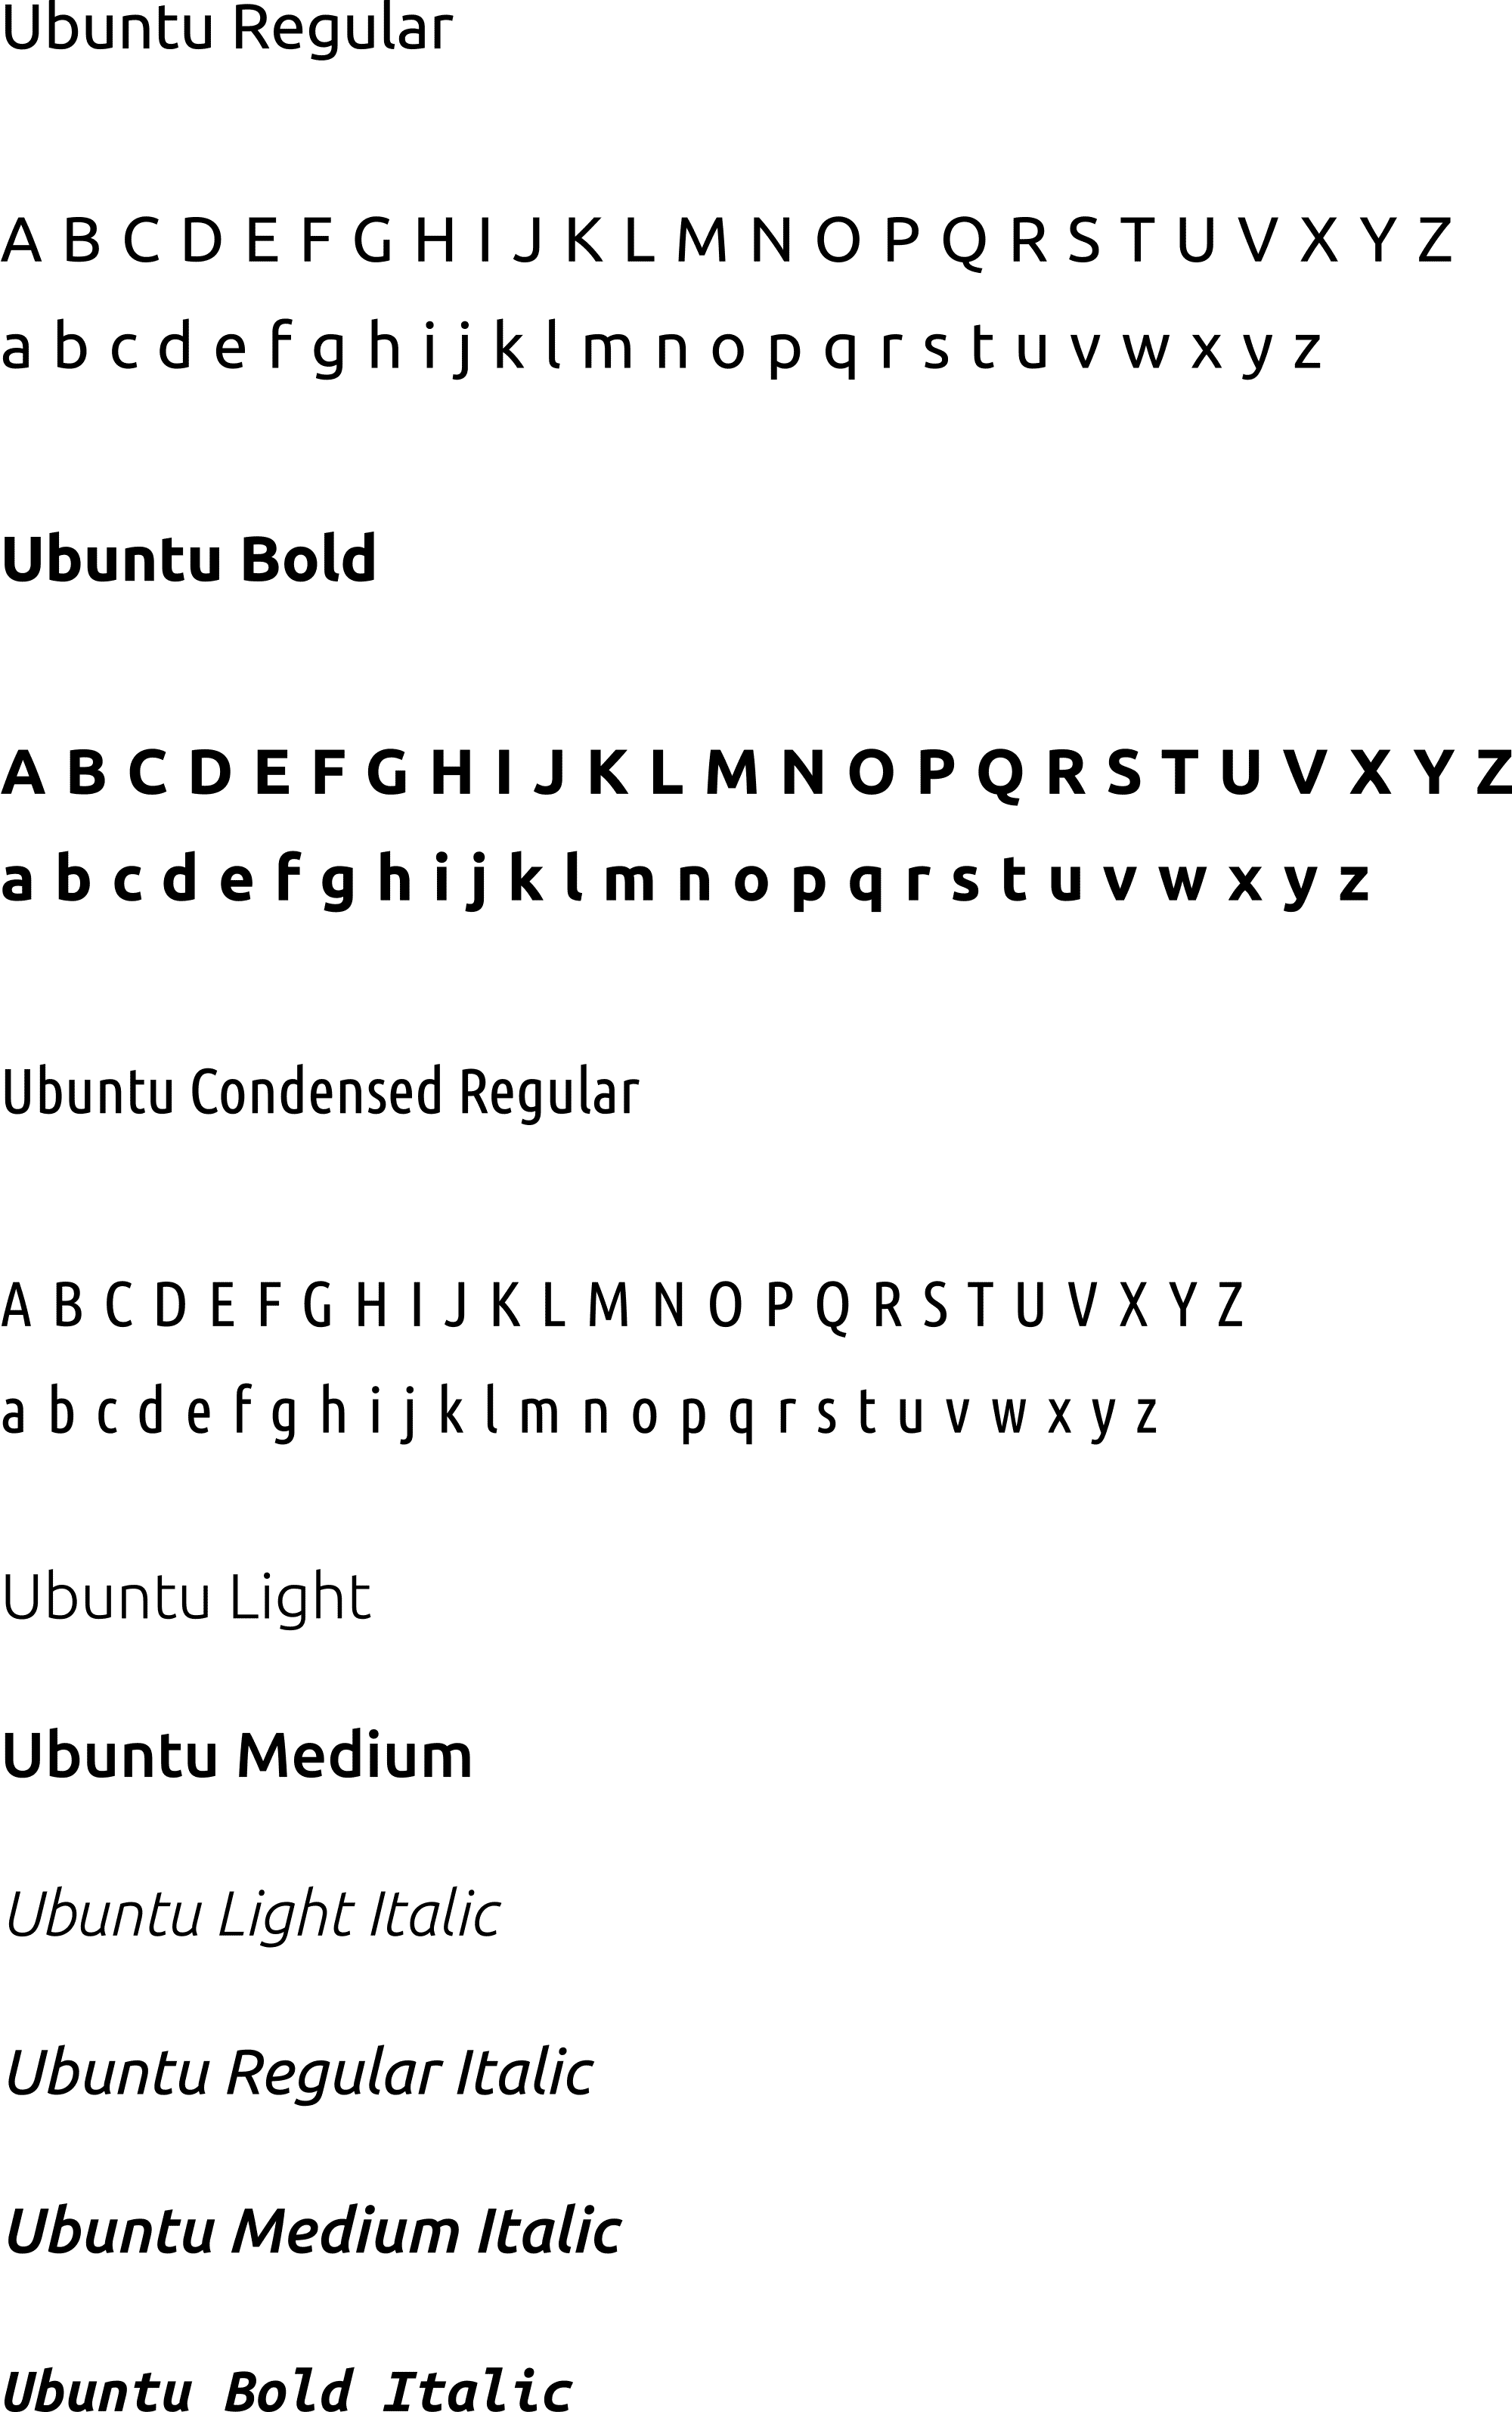 FMD – Corporate Schrift – Ubuntu